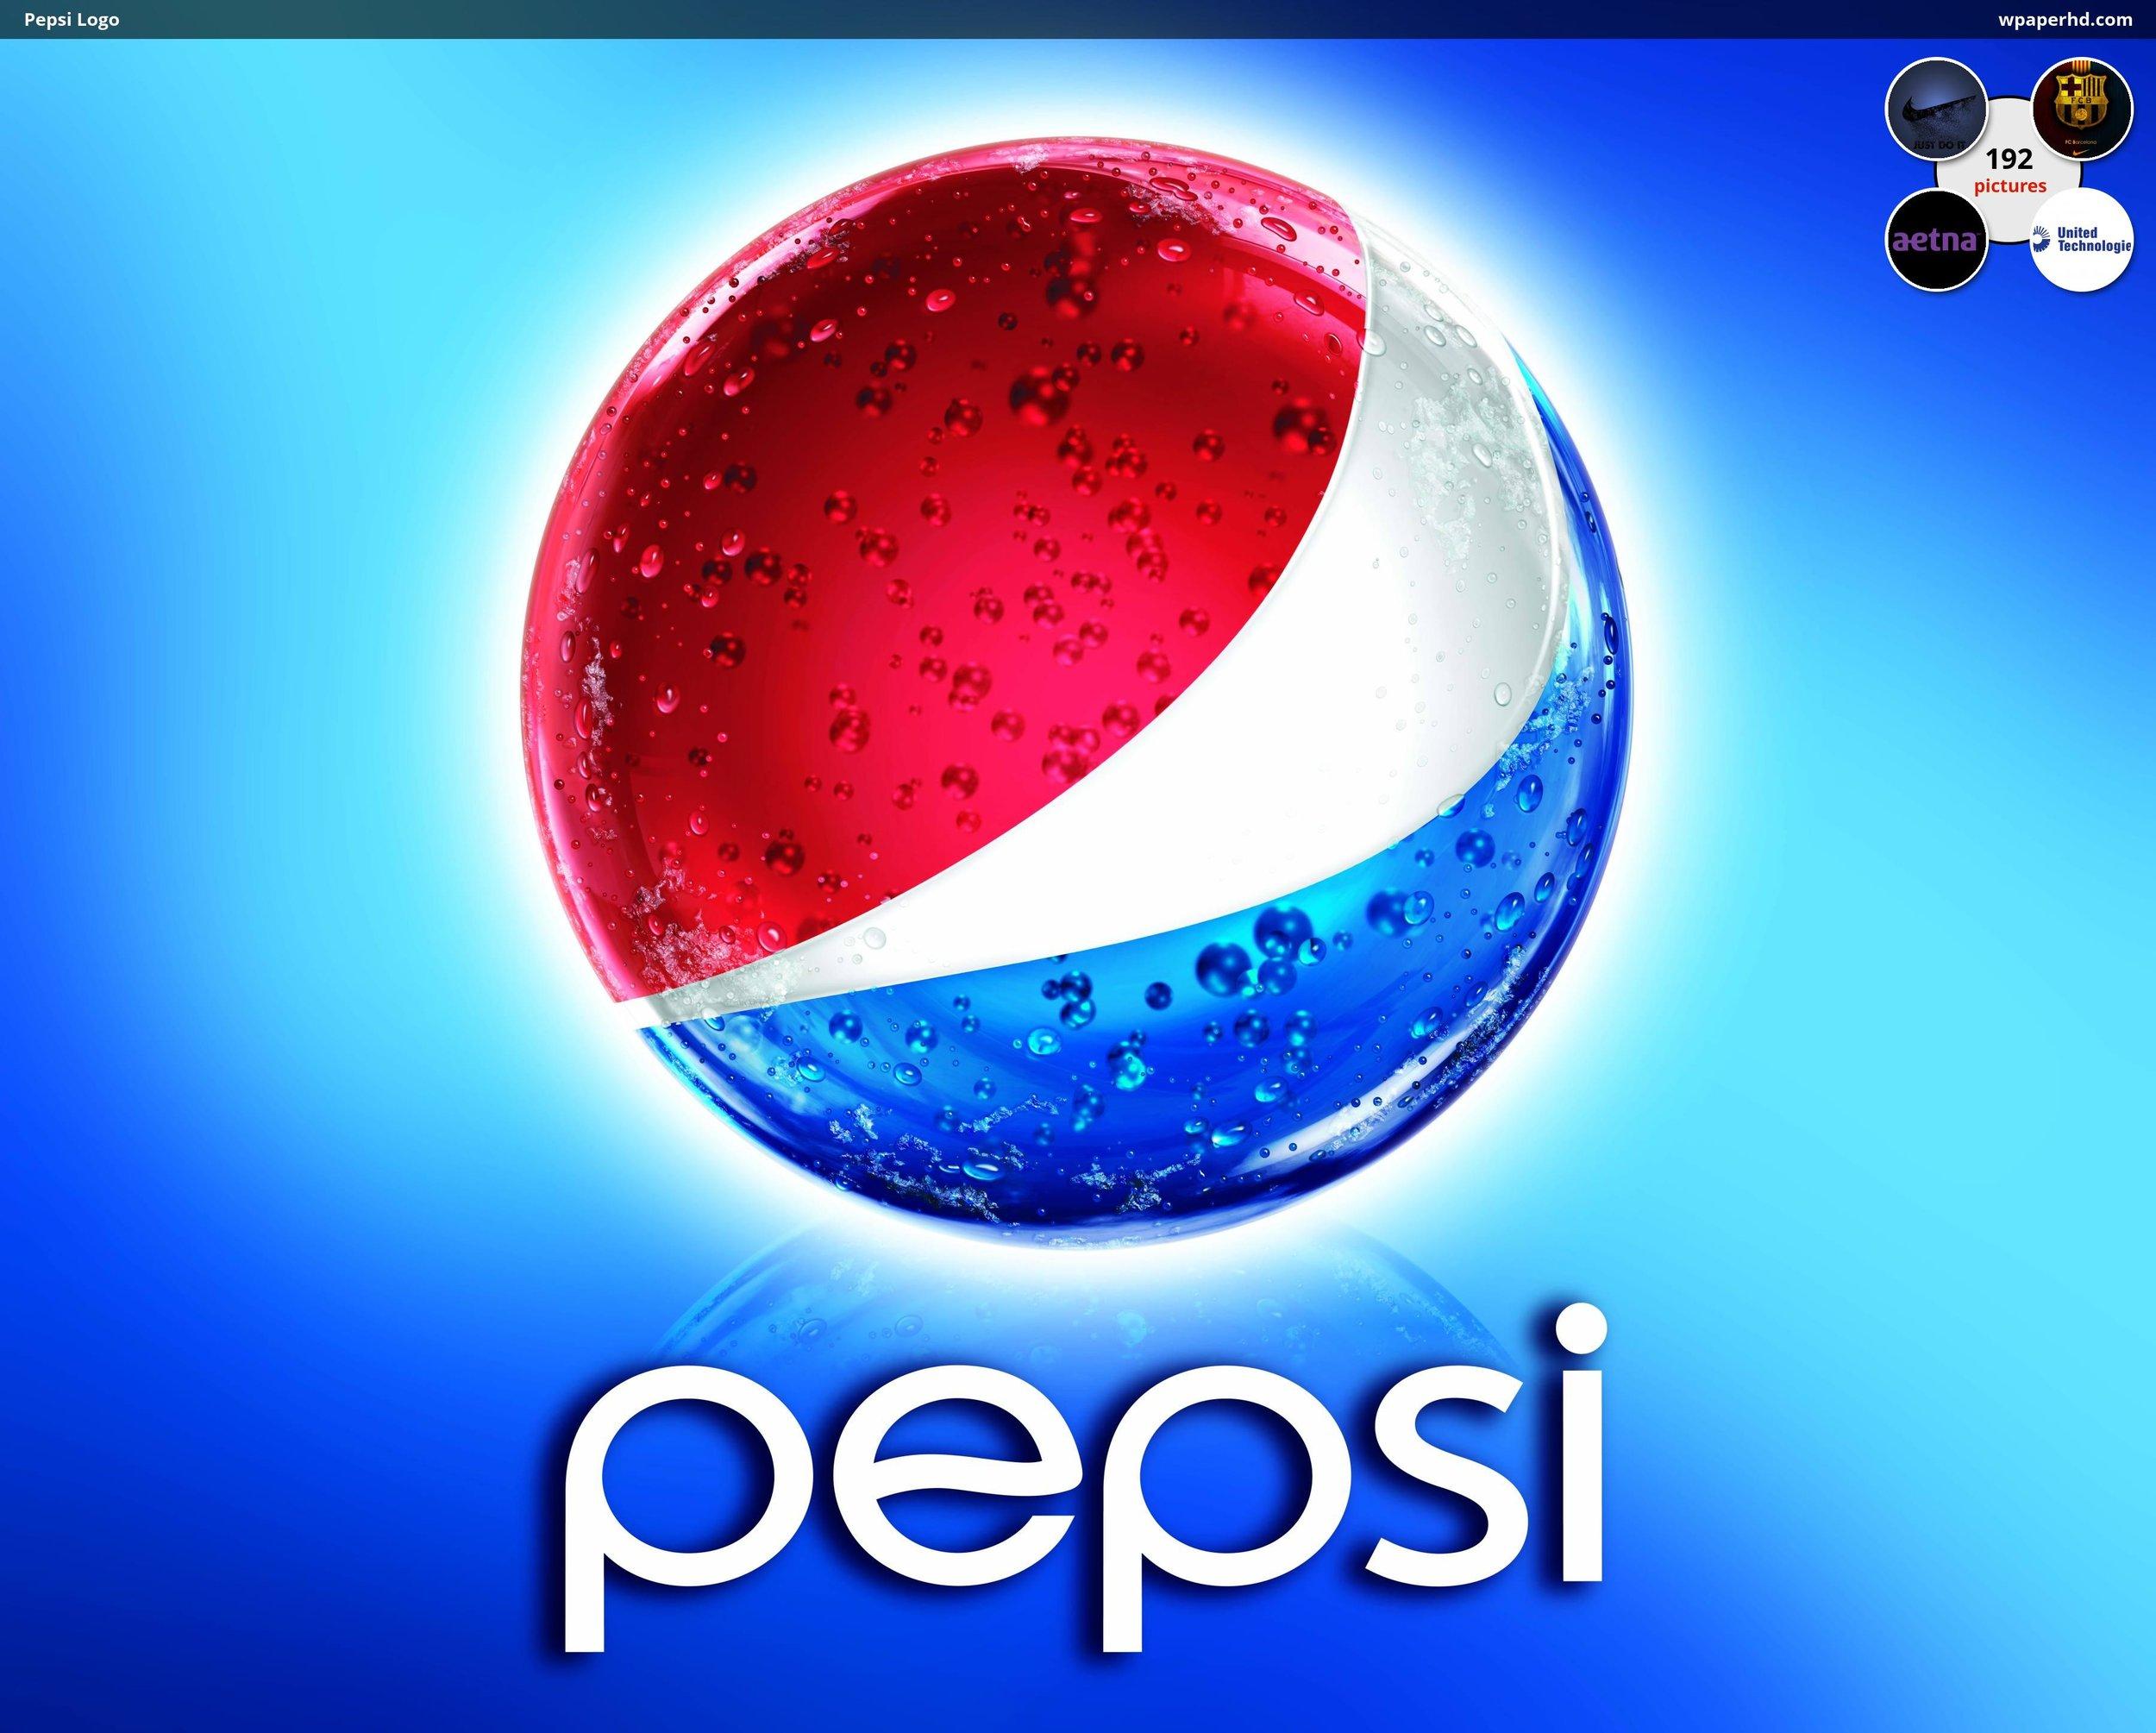 pepsi-logo-QABZ.jpg